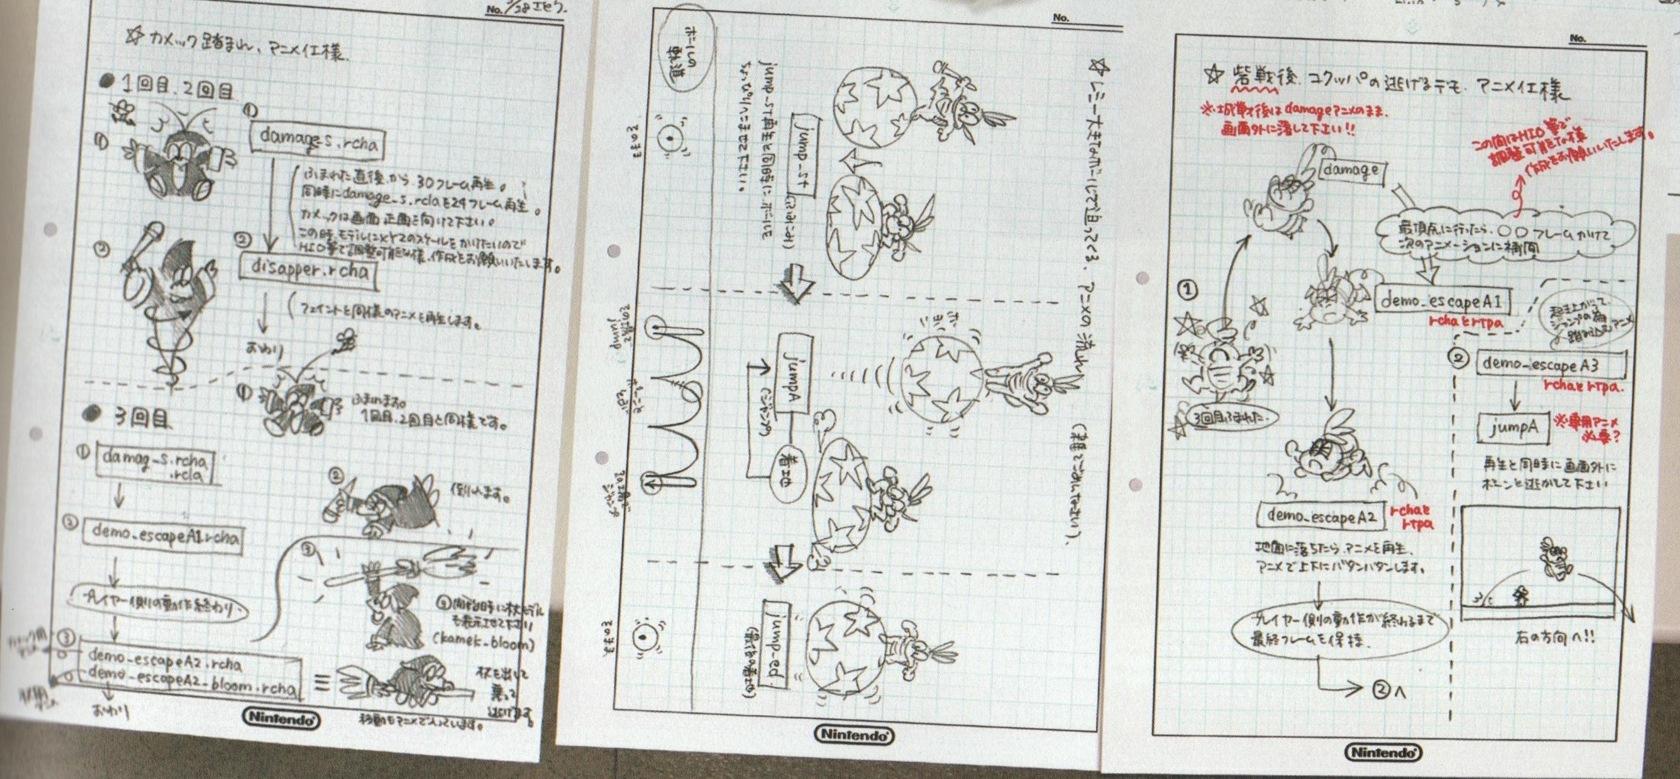 Image Koopa Bosses Concept Mariowiki Fandom Powered By Wikia Luigi Circuit Wii Super Mario Wiki The Encyclopedia